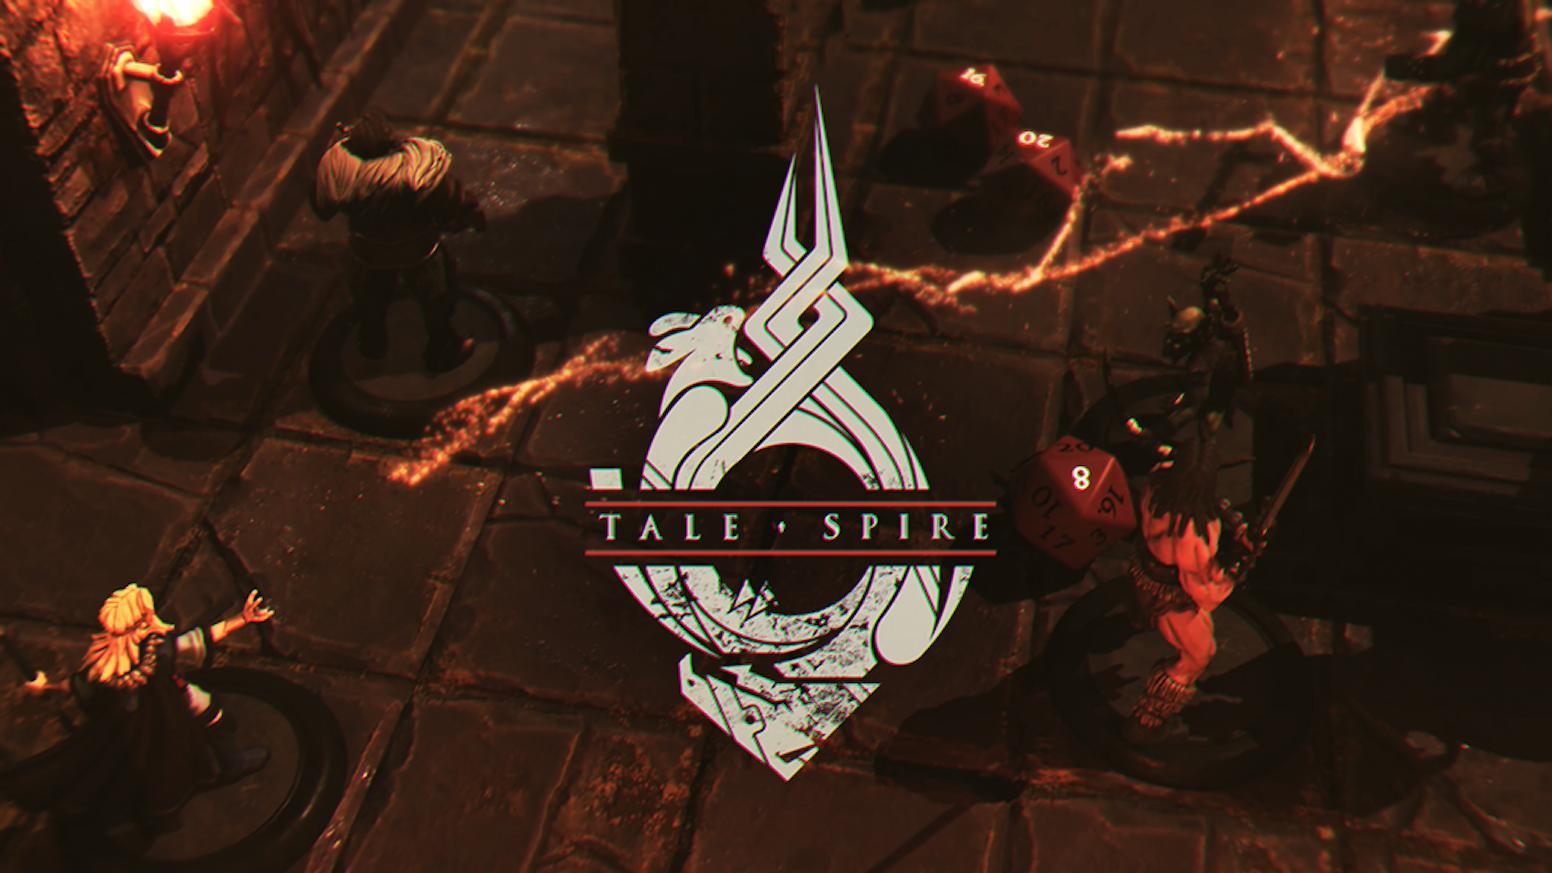 Tale Spire: Pen & Paper RPGs Resculpted Online